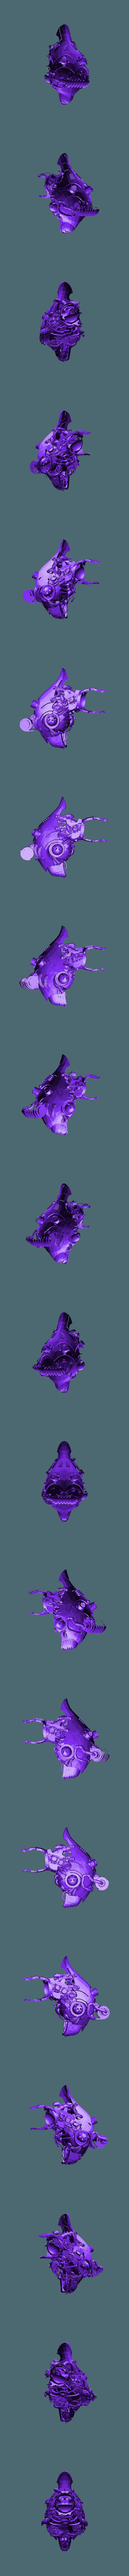 Grimdark_Kastelan_with_Xenos_trophies.stl Download free STL file Grimdark Chrono Trigger Bits • 3D printer object, ErikTheHeretek